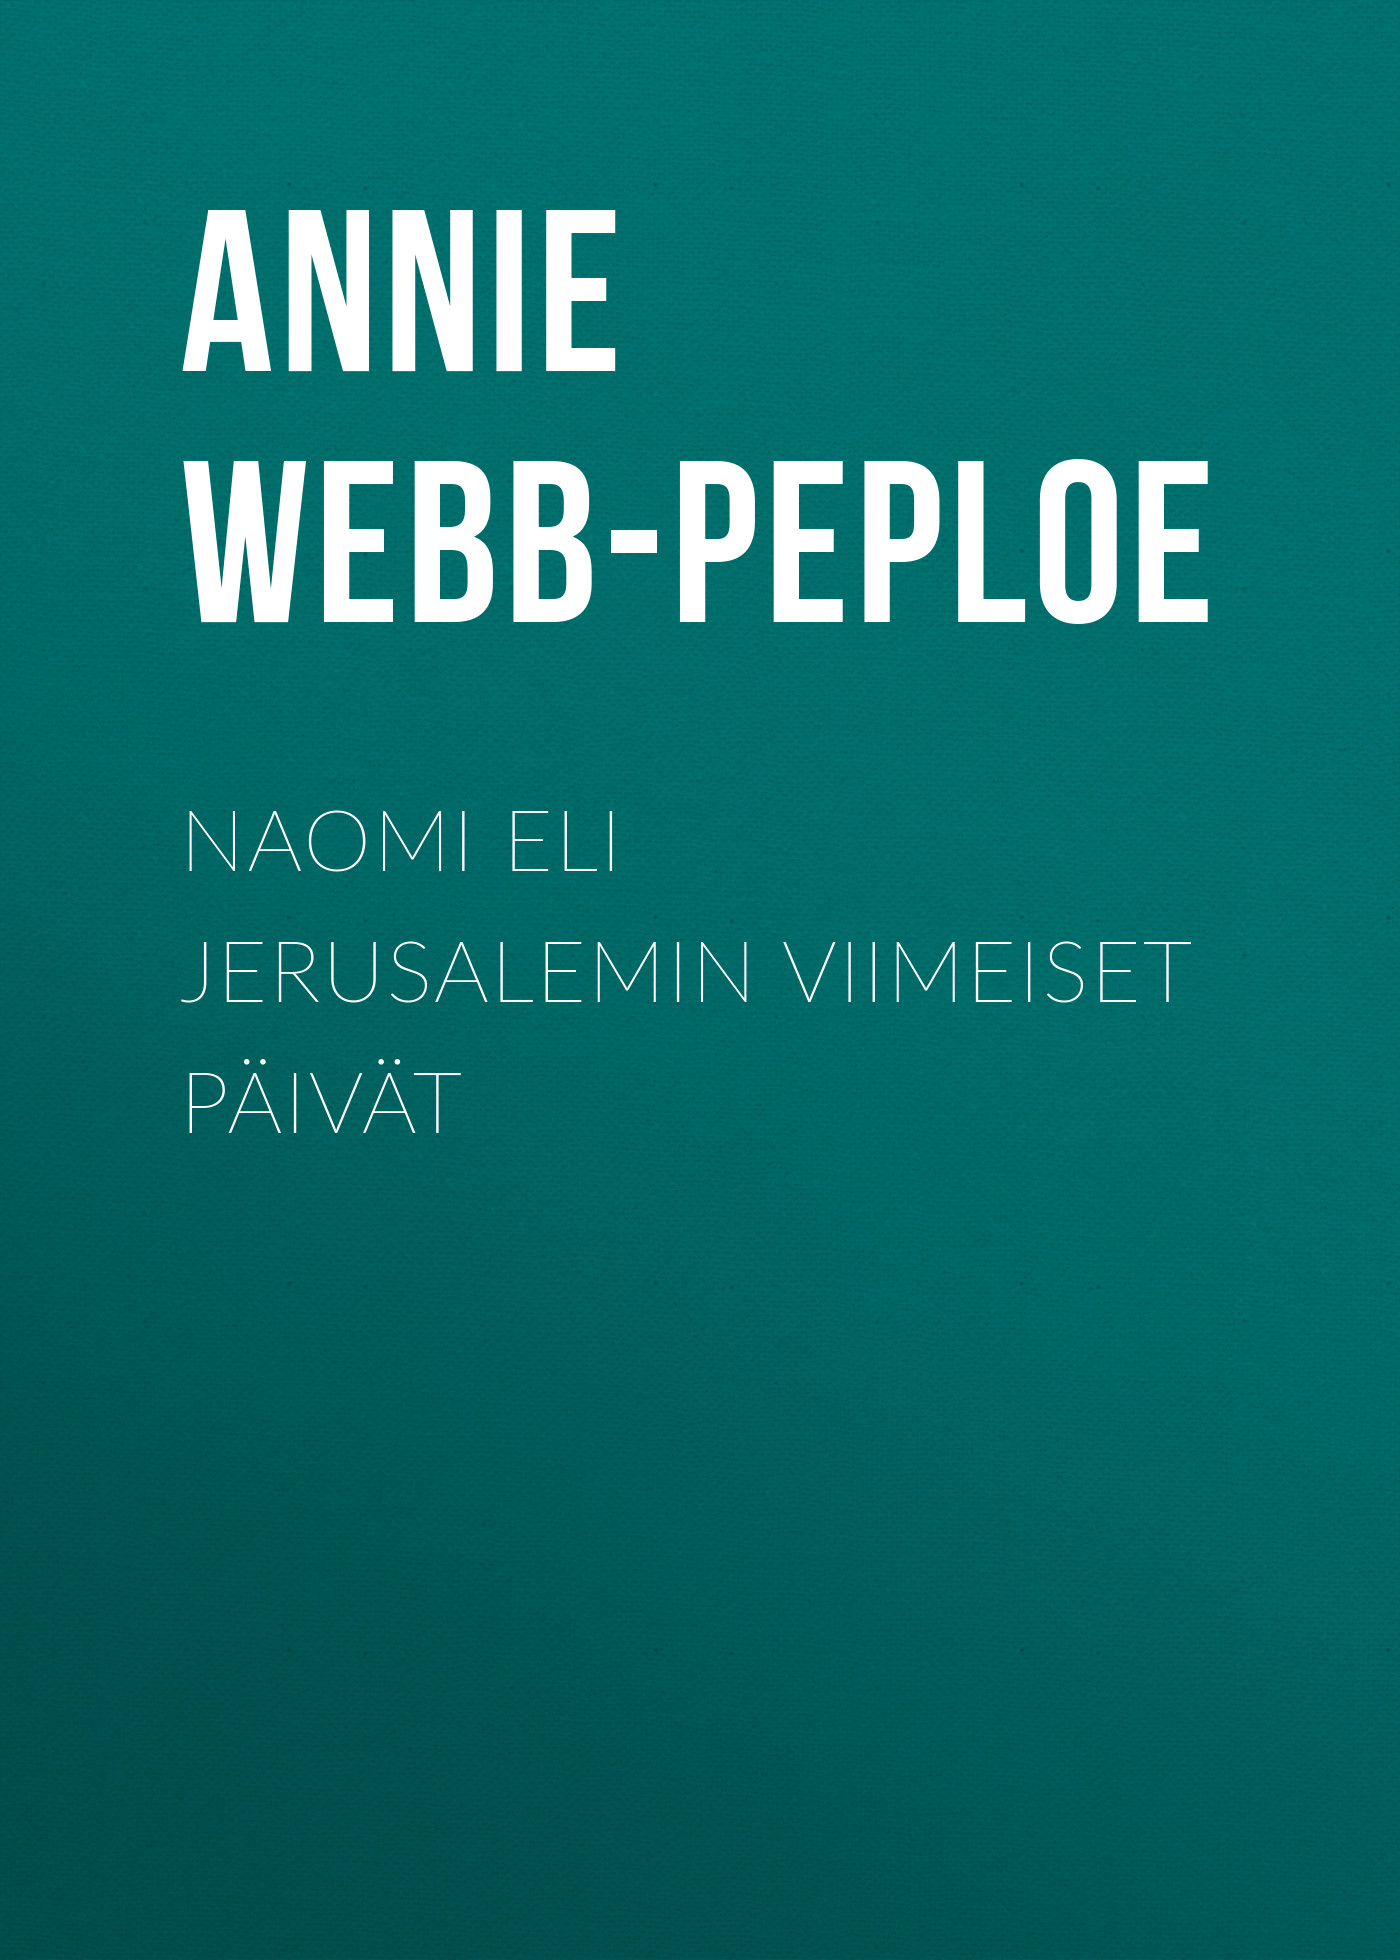 Annie Webb-Peploe Naomi eli Jerusalemin viimeiset päivät